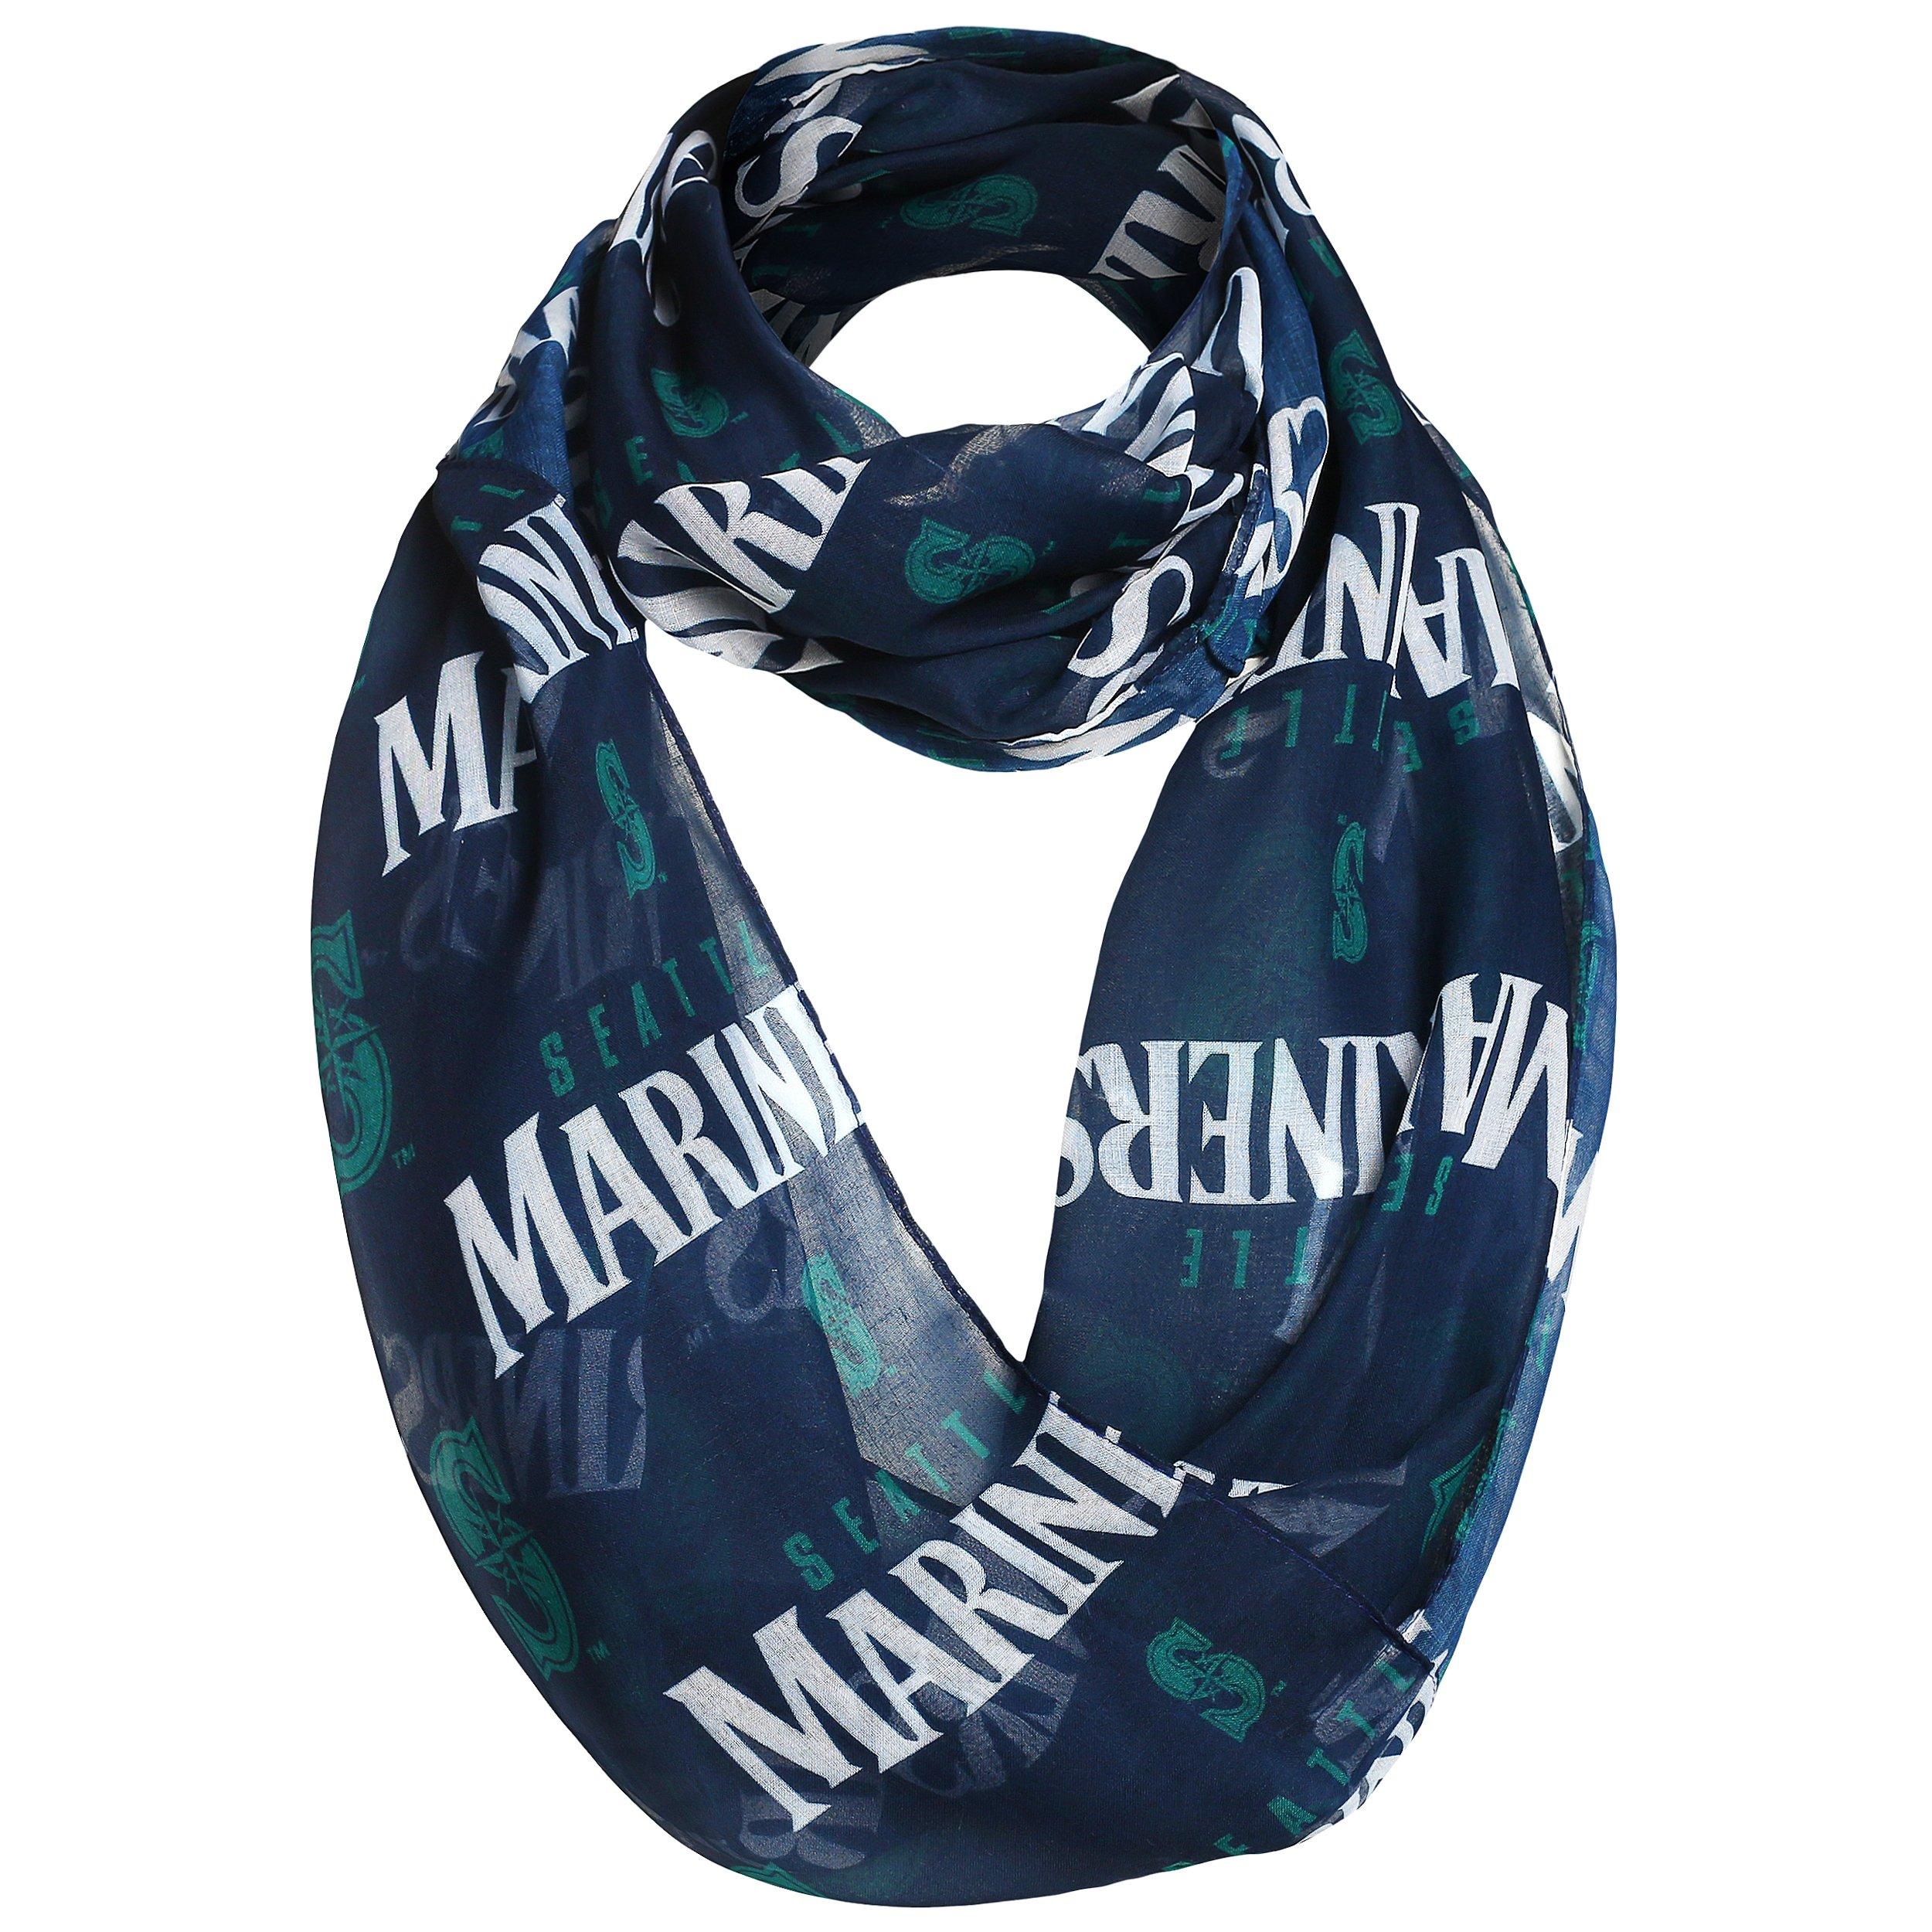 Seattle Mariners 2016 Team Logo Infinity Scarf